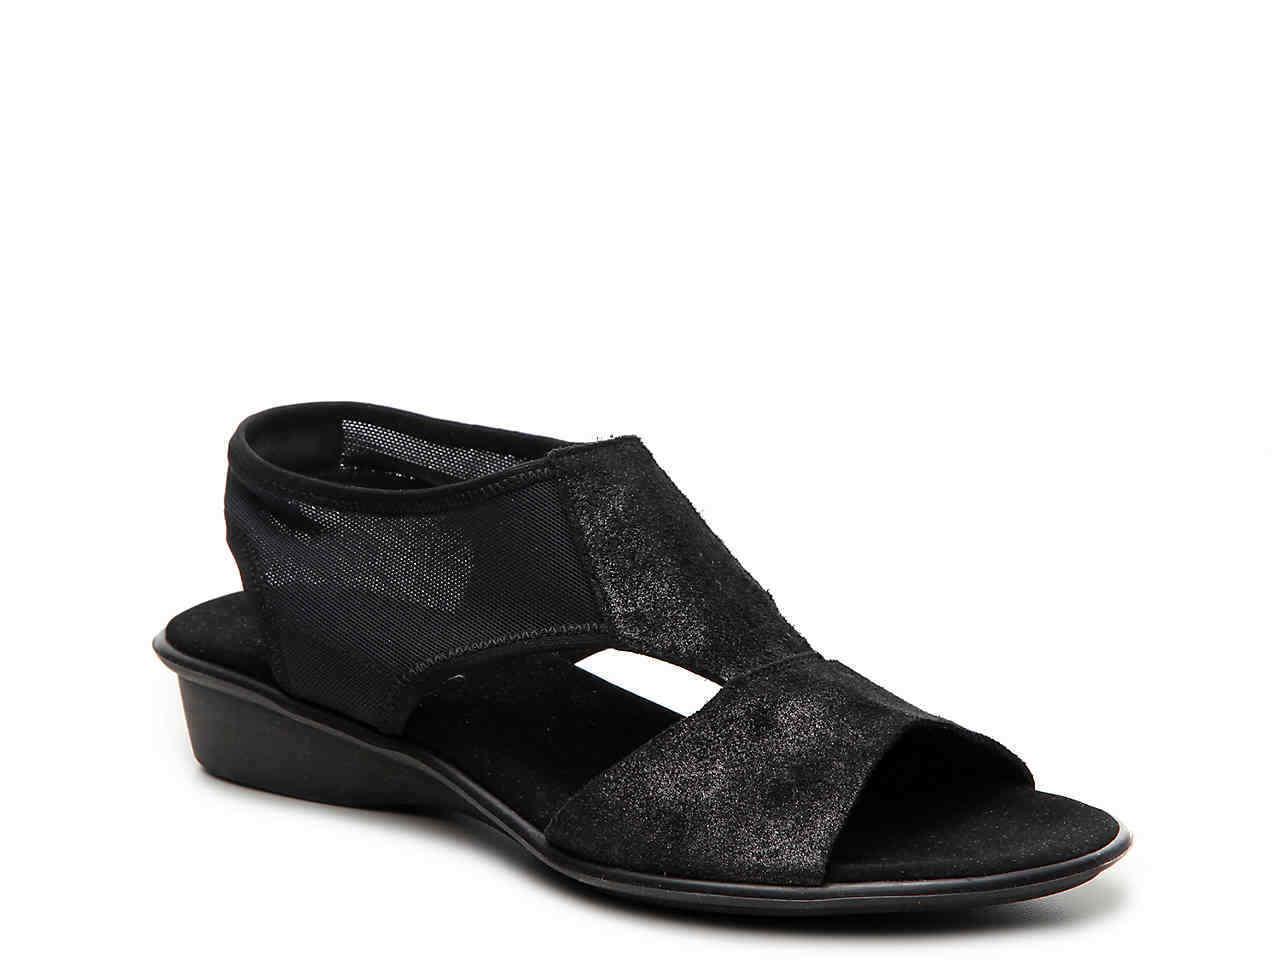 Womens Womens Womens Sesto Meucci Elite Black Size 7.5 Narrow Width  134 Retail f4a65b